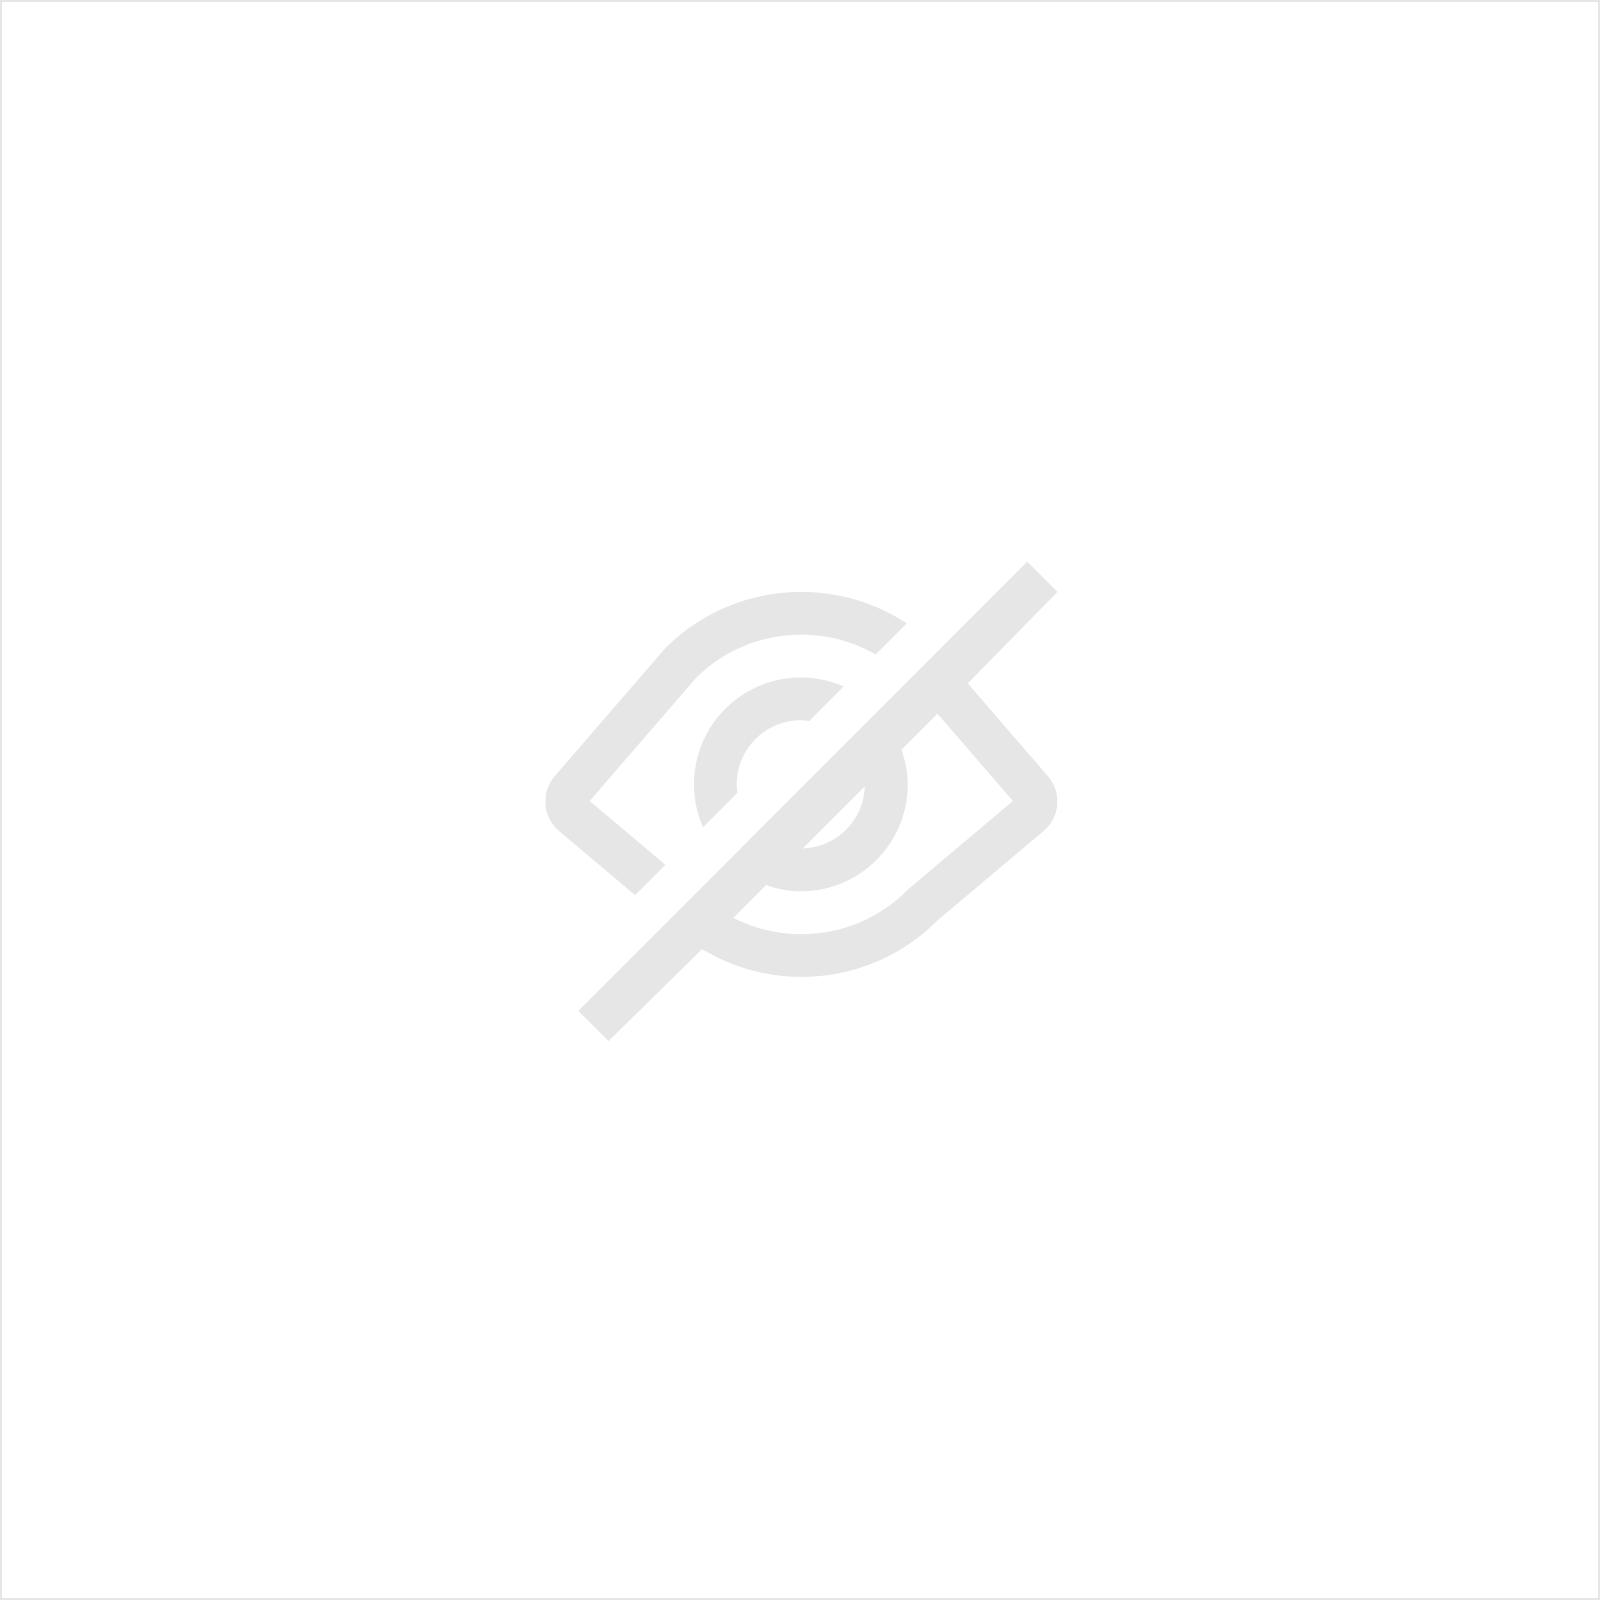 CLECO KLEM MET BEK 1/2   (19 mm)